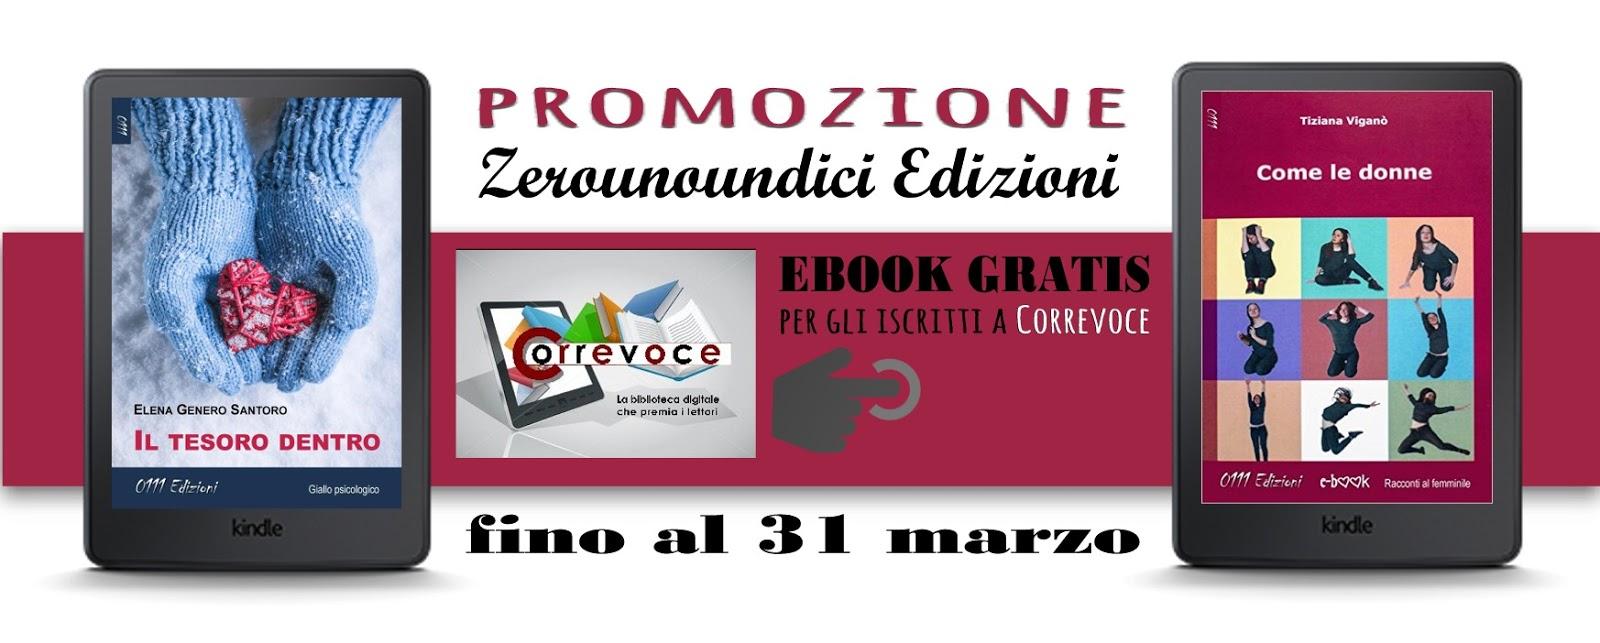 ebook gratis correvoce